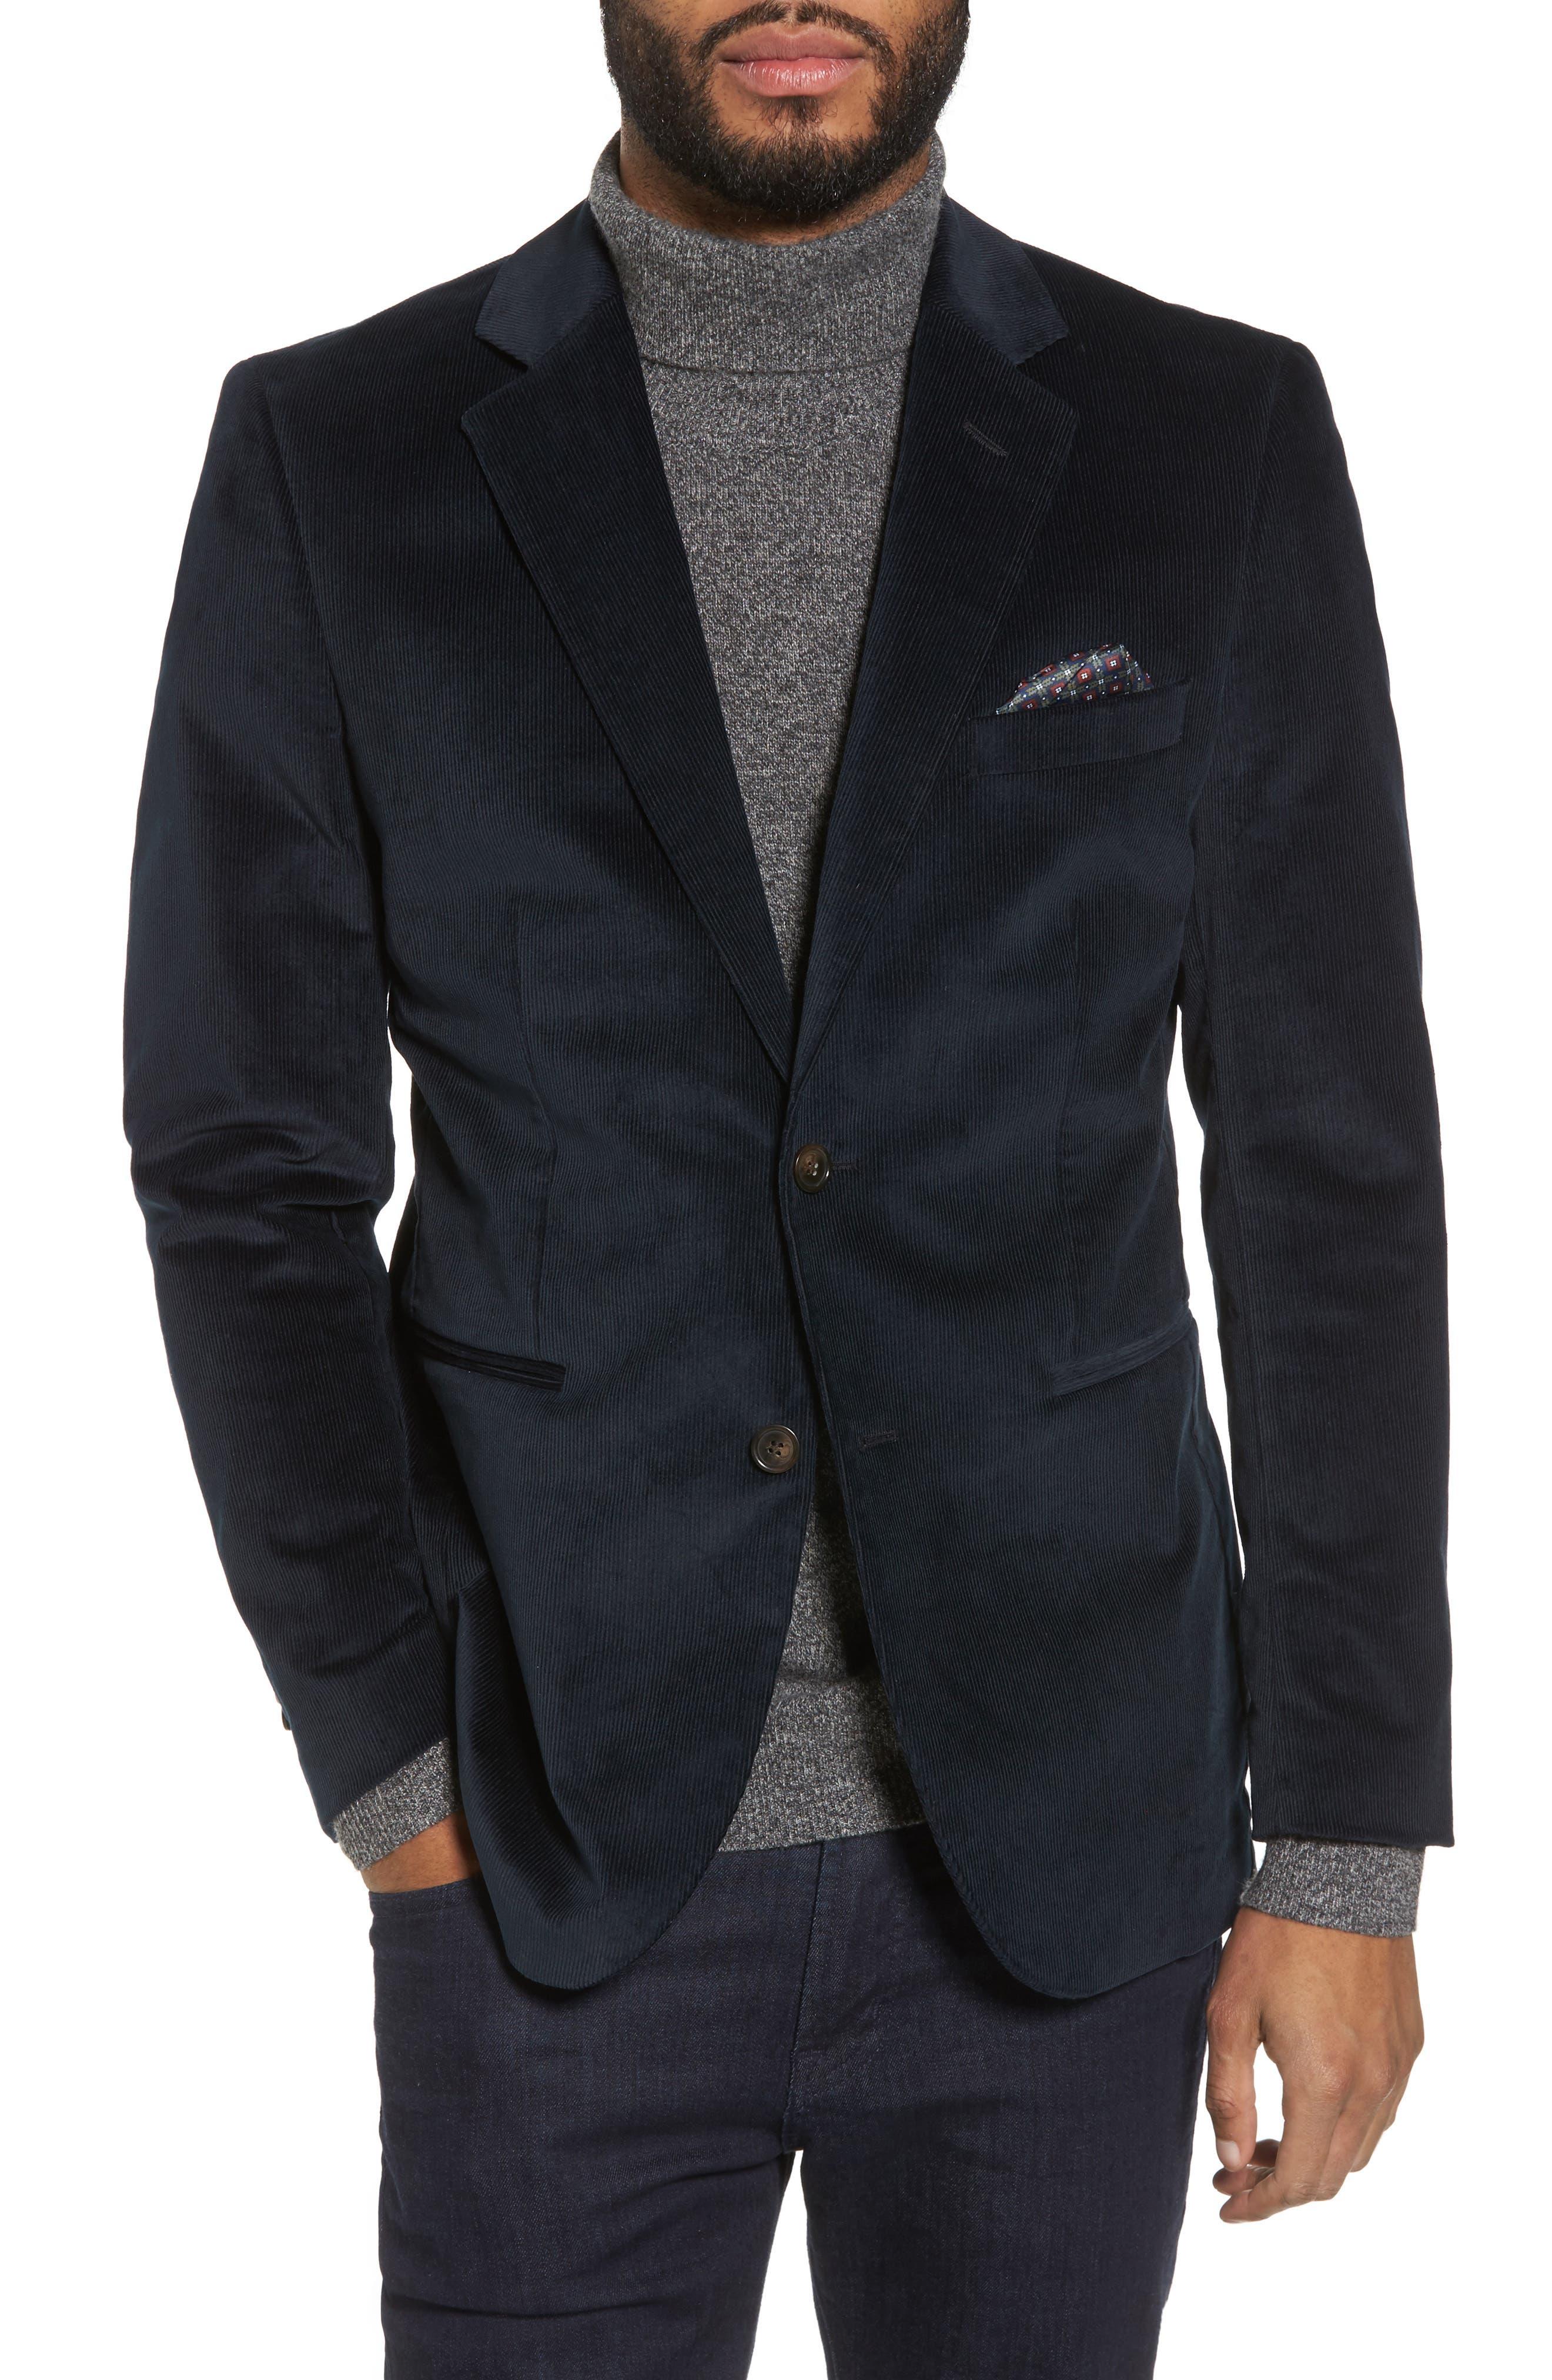 Kord Trim Fit Corduroy Blazer,                         Main,                         color, Black Iris